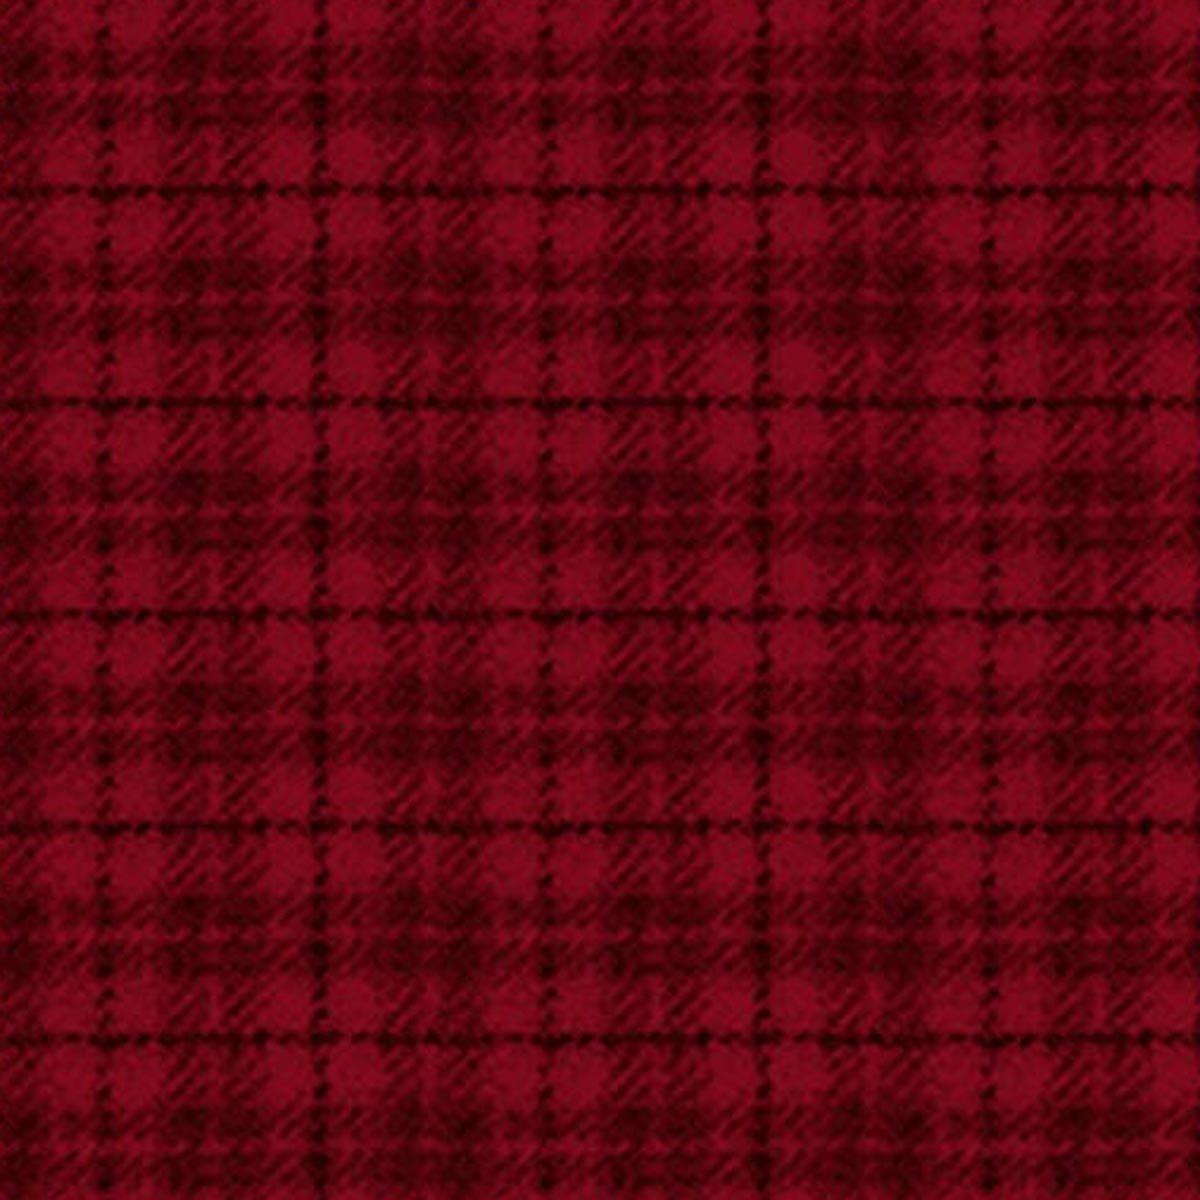 Woolies Flannel - MASF18502-R